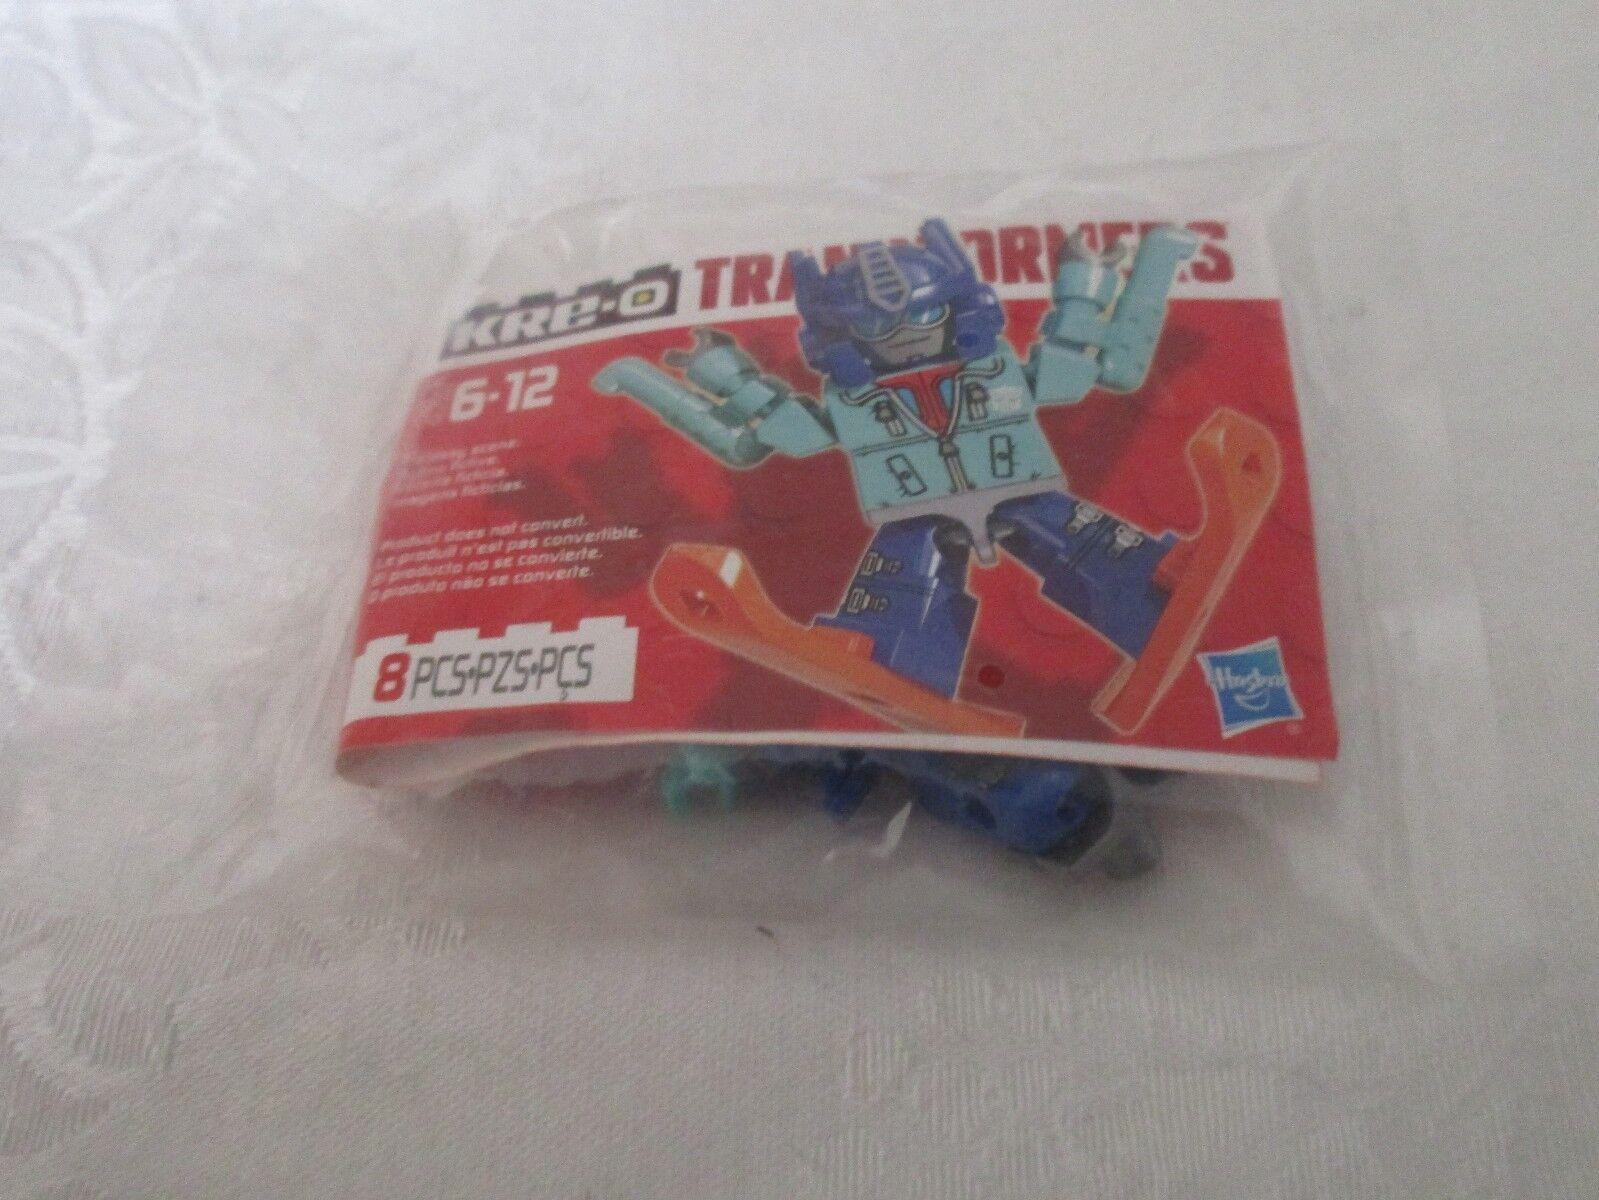 Hasbro Kre-o Transformers Optimus Prime Figura De Esquí Esquí 83904